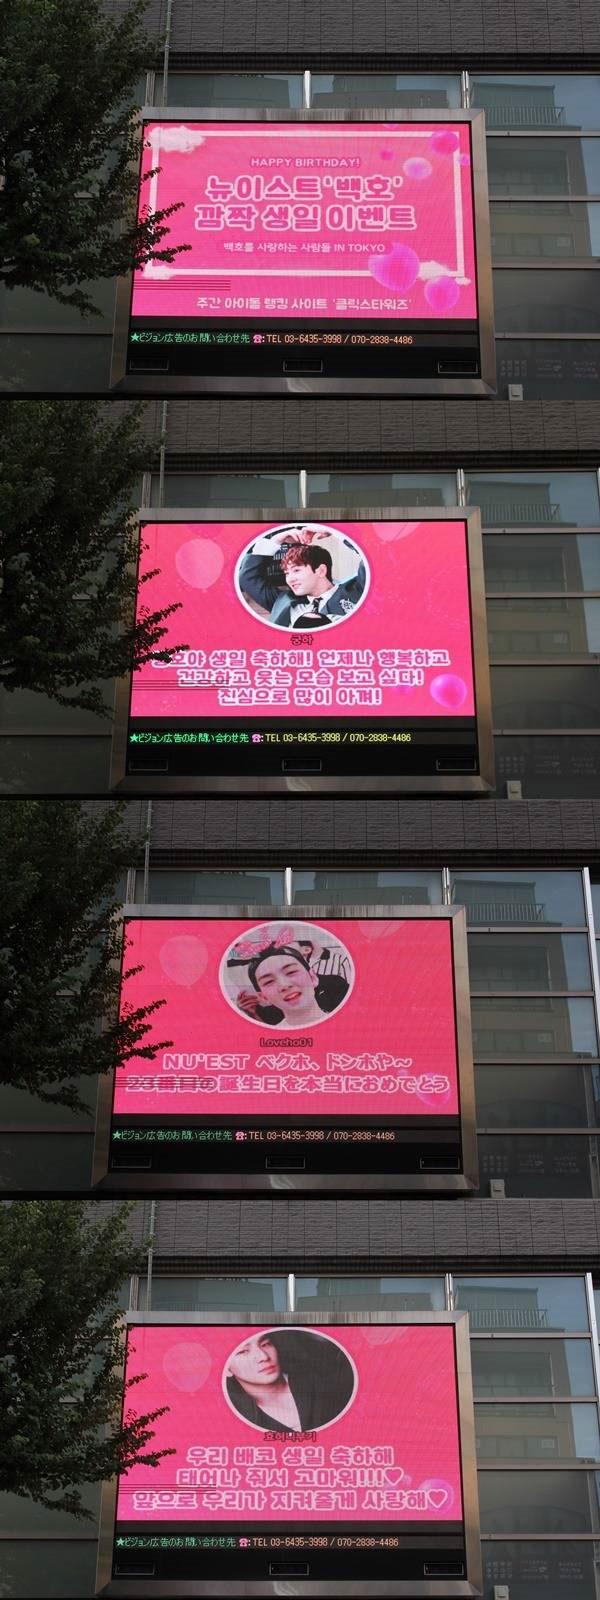 東京・新大久保電光掲示板で上映中の動画。|写真:Click! StarWars